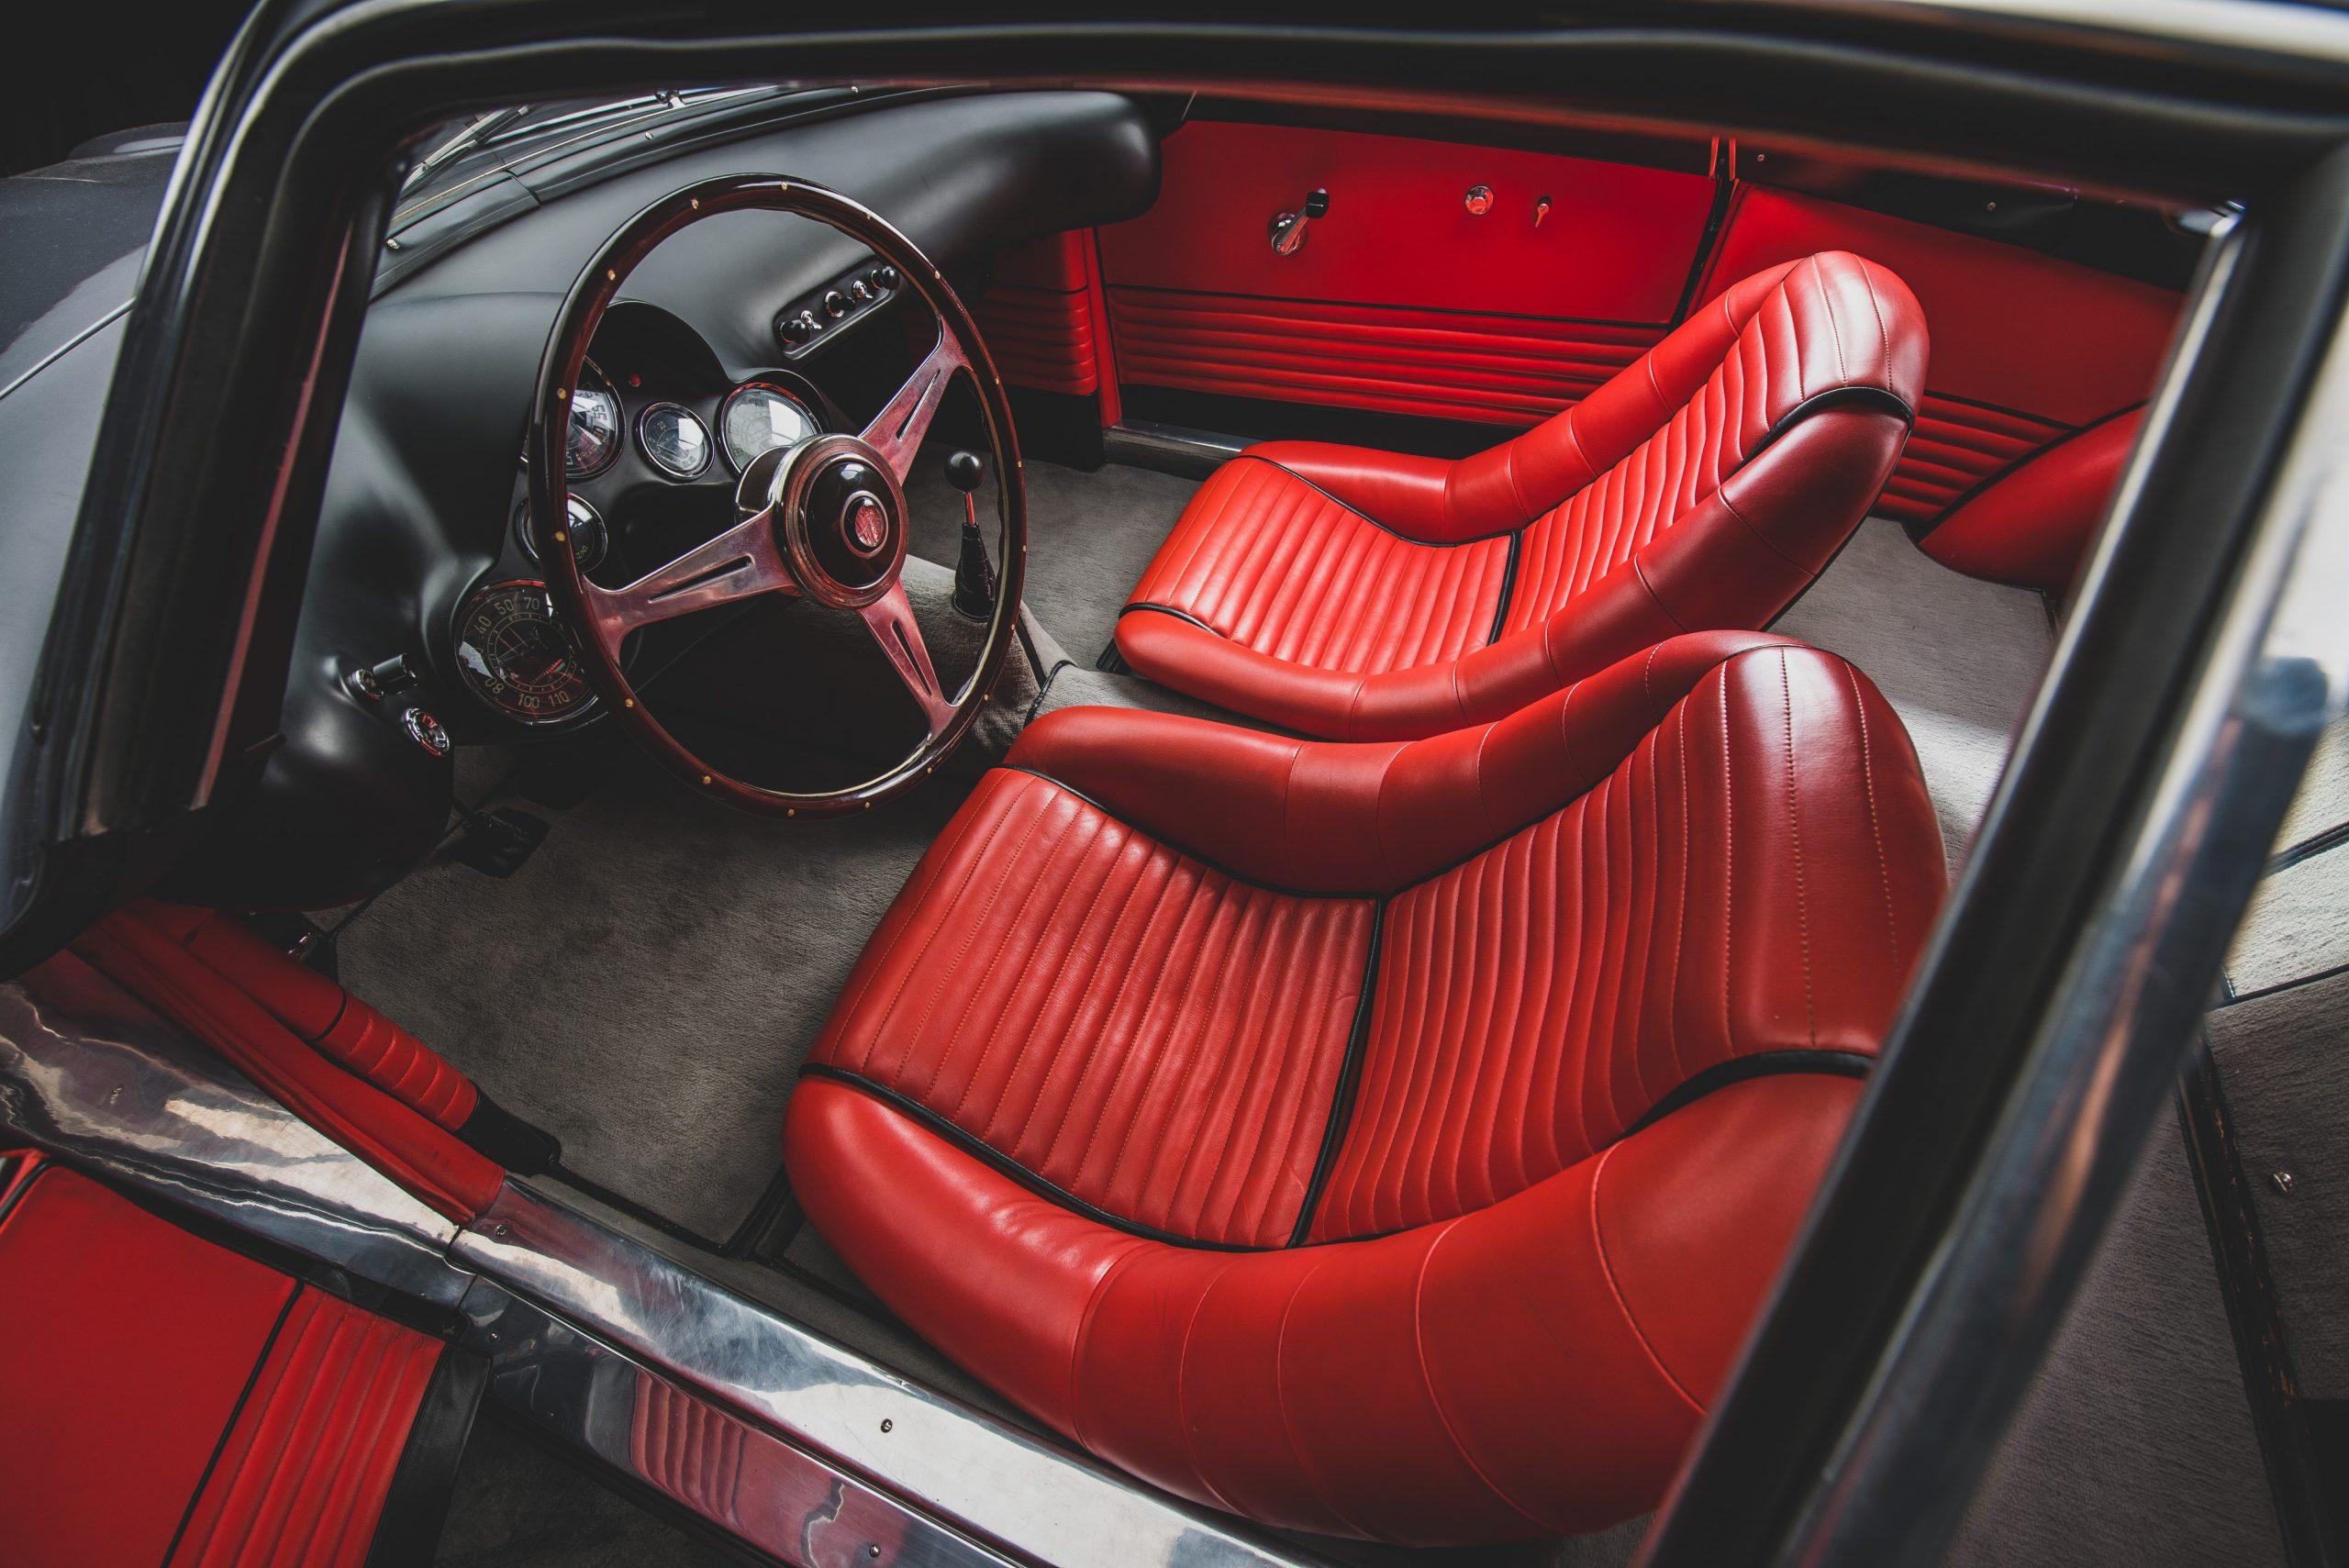 Alfa Romeo Berlina Aerodinamica Tecnica interior seats